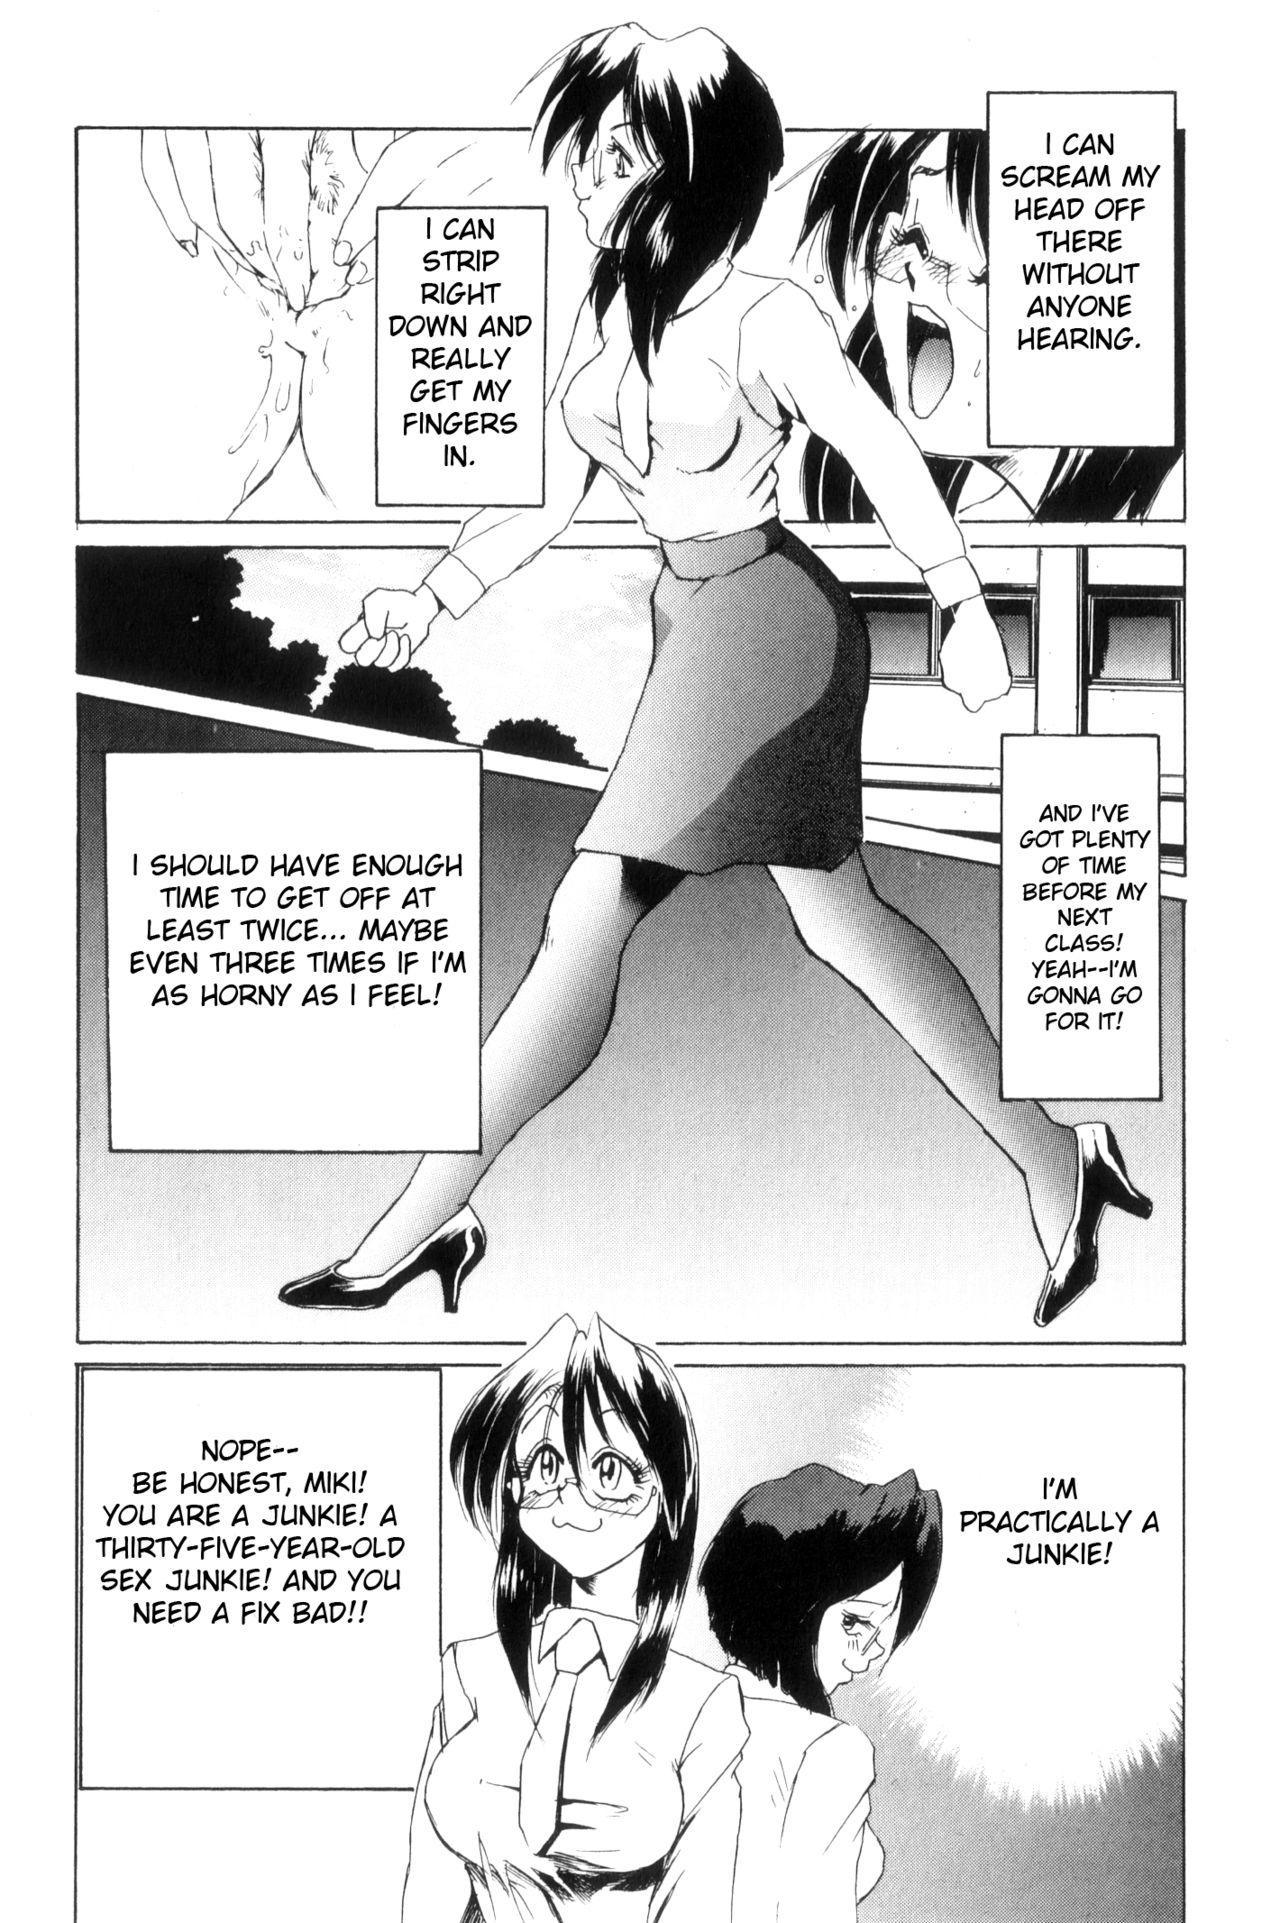 [NeWMeN] Secret Plot [Shinsouban] Ch. 1-6 [English] 25